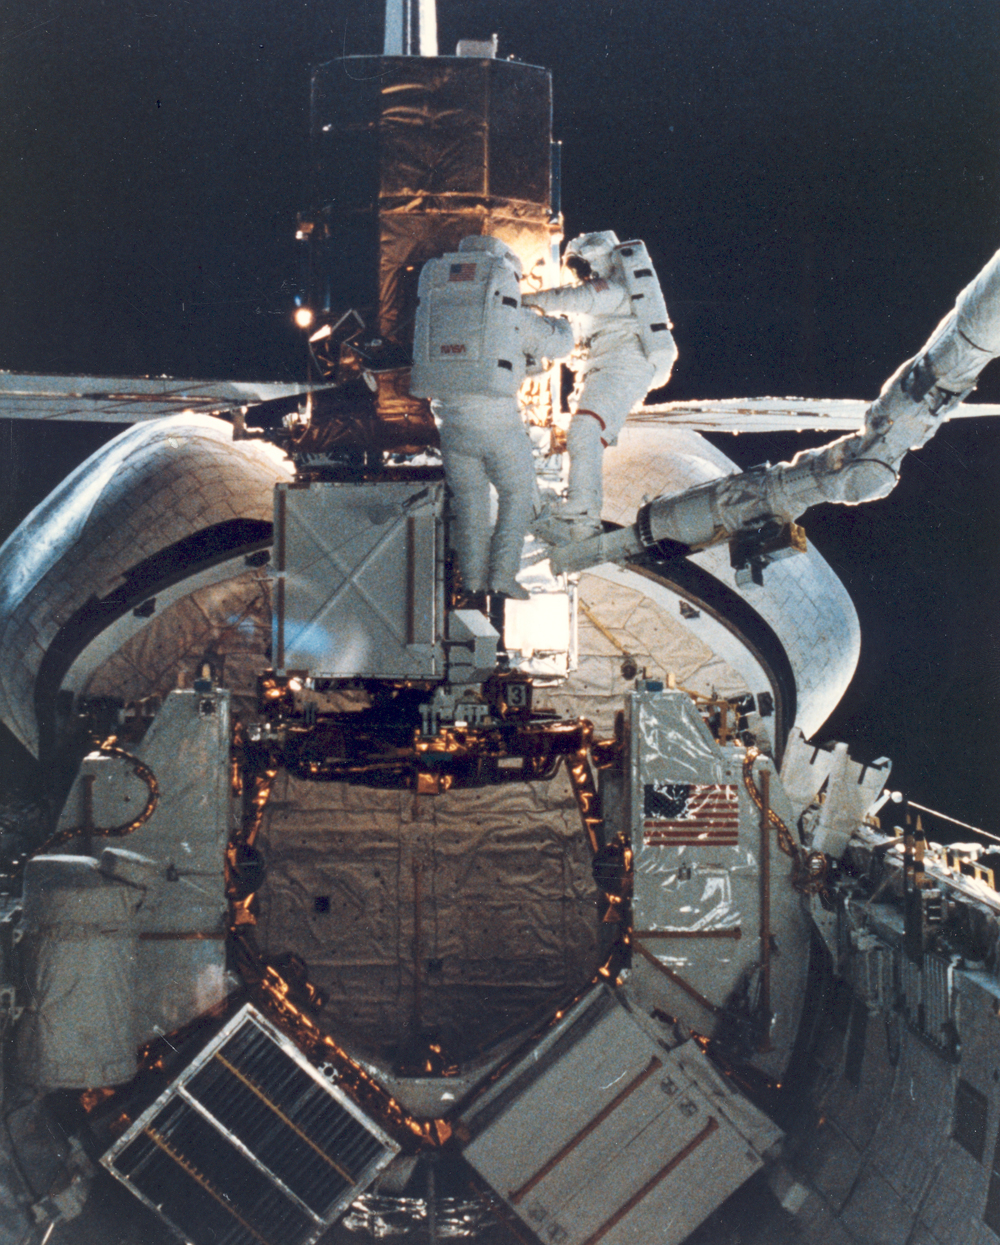 A Satellite Repair Shop: STS-41C (Challenger)